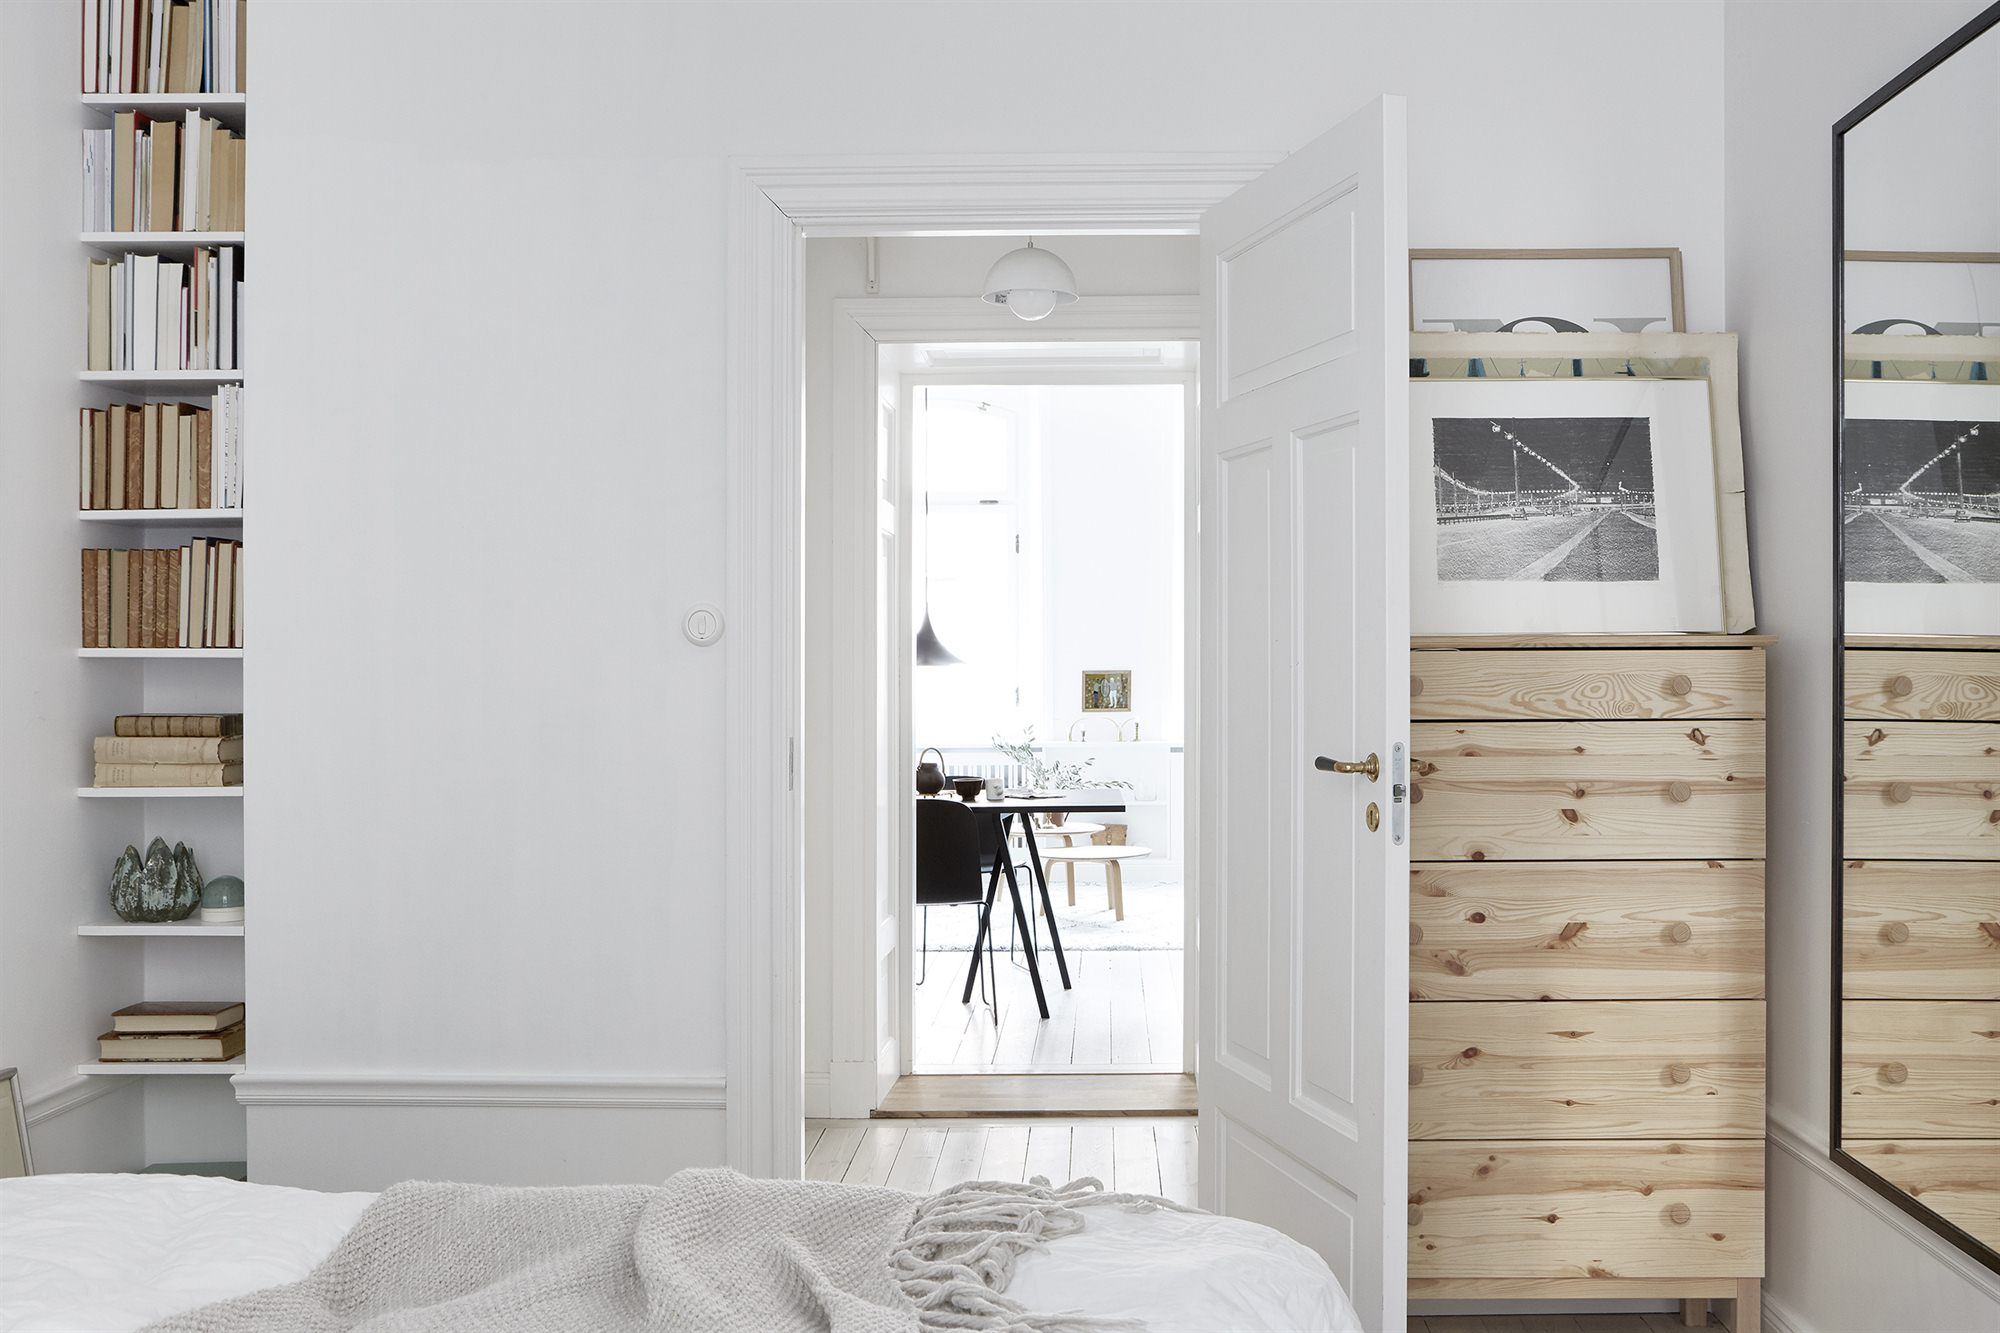 inbouwboekenkast-slaapkamer